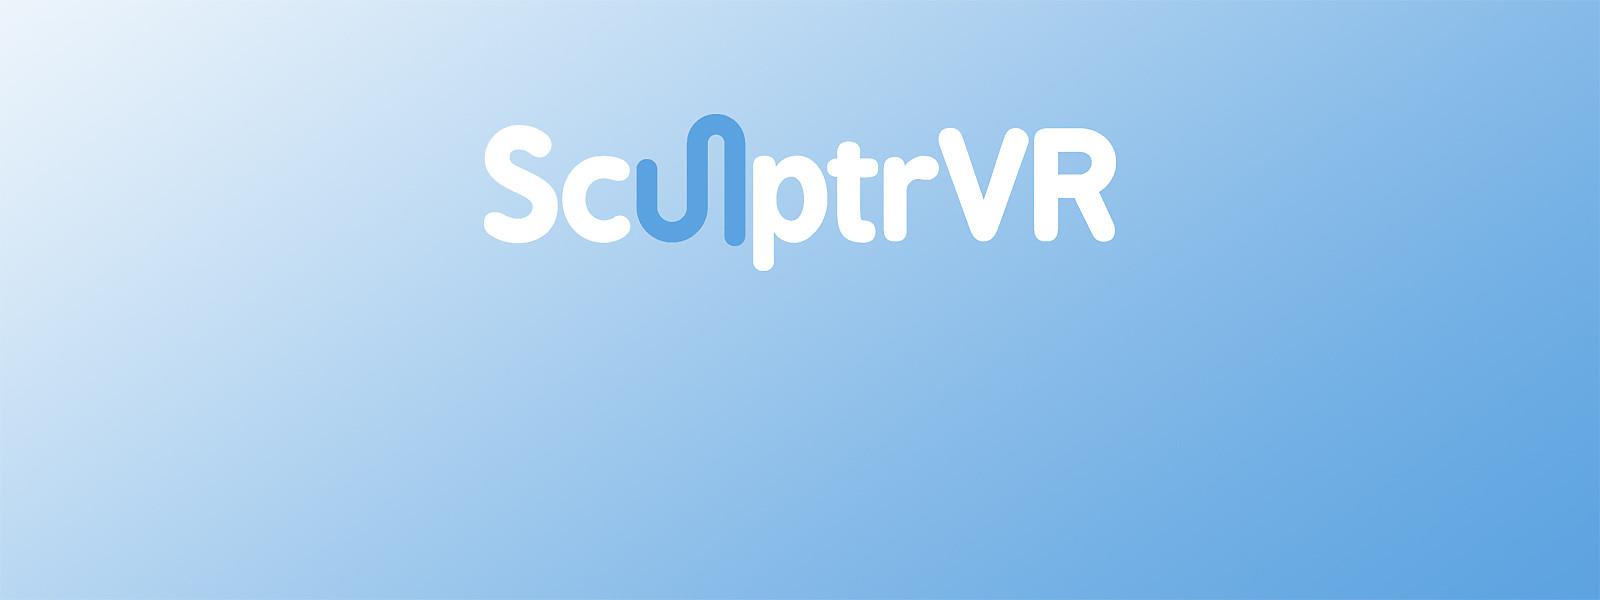 Sculptrvr Game Ps4 Playstation